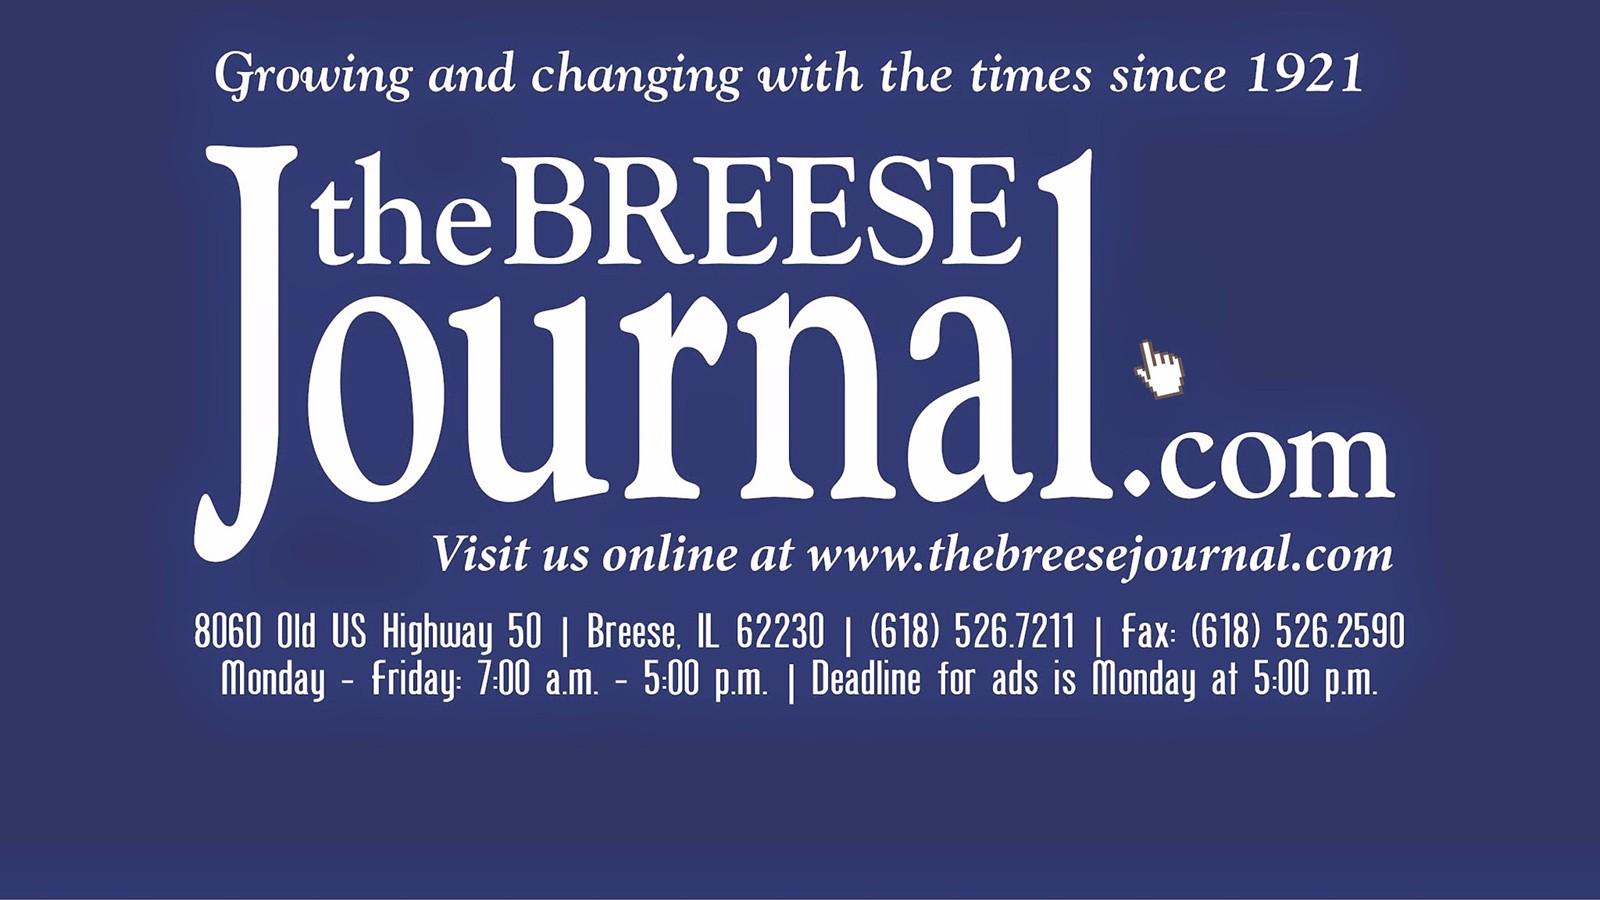 Breese Journal